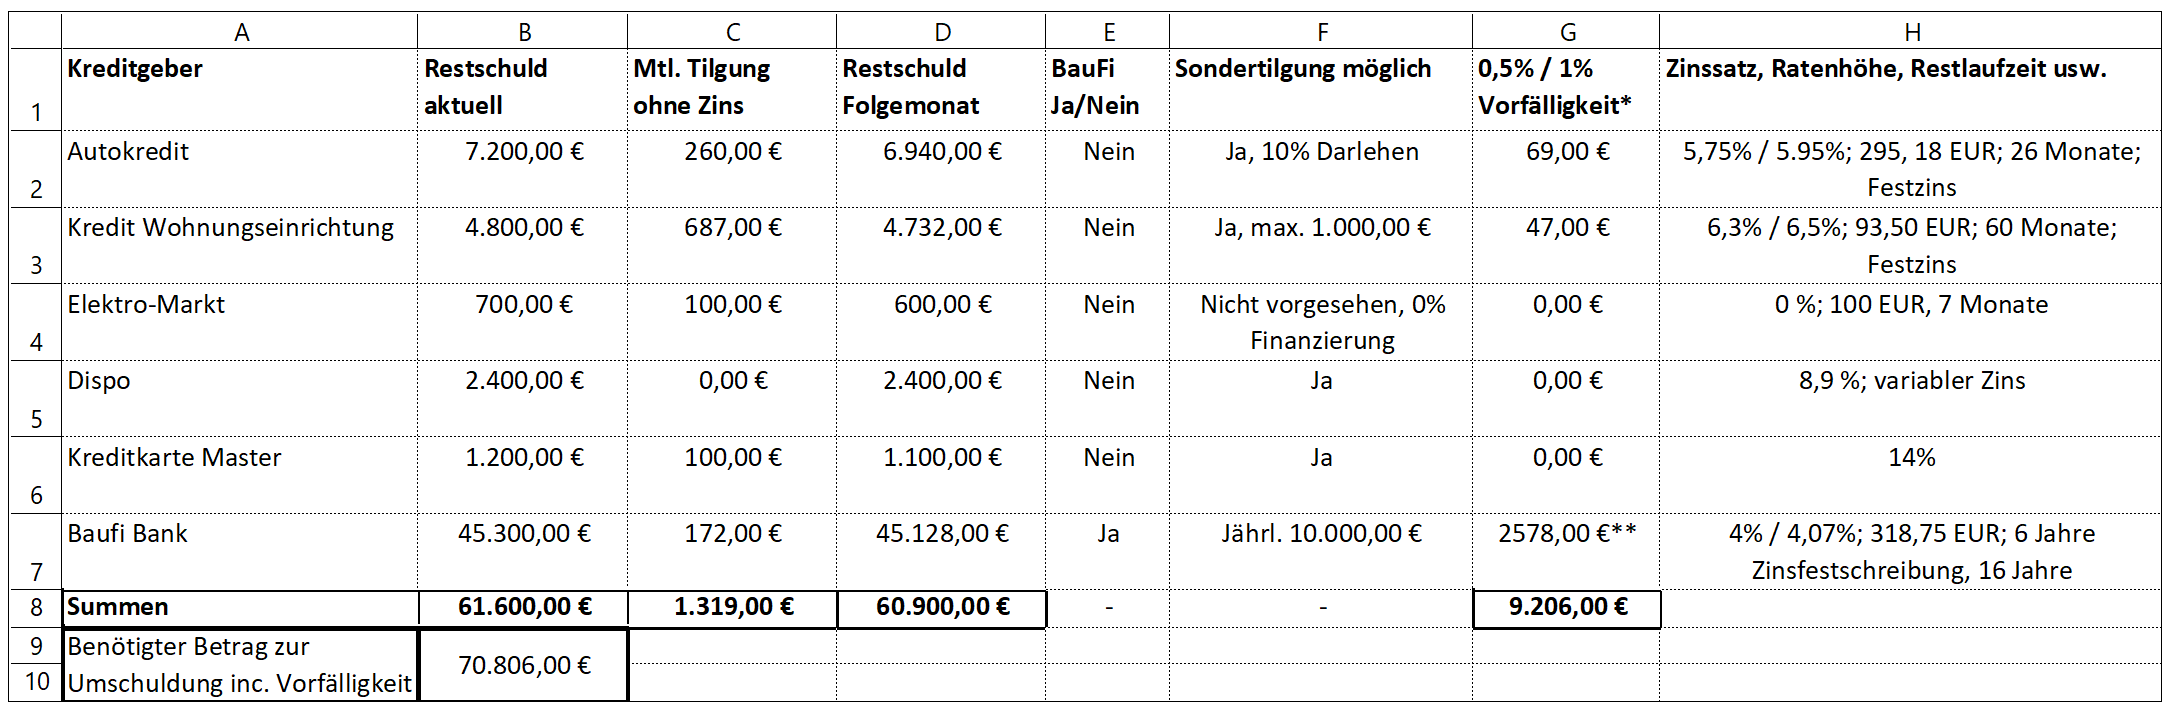 Tabelle Kredite Umschulden